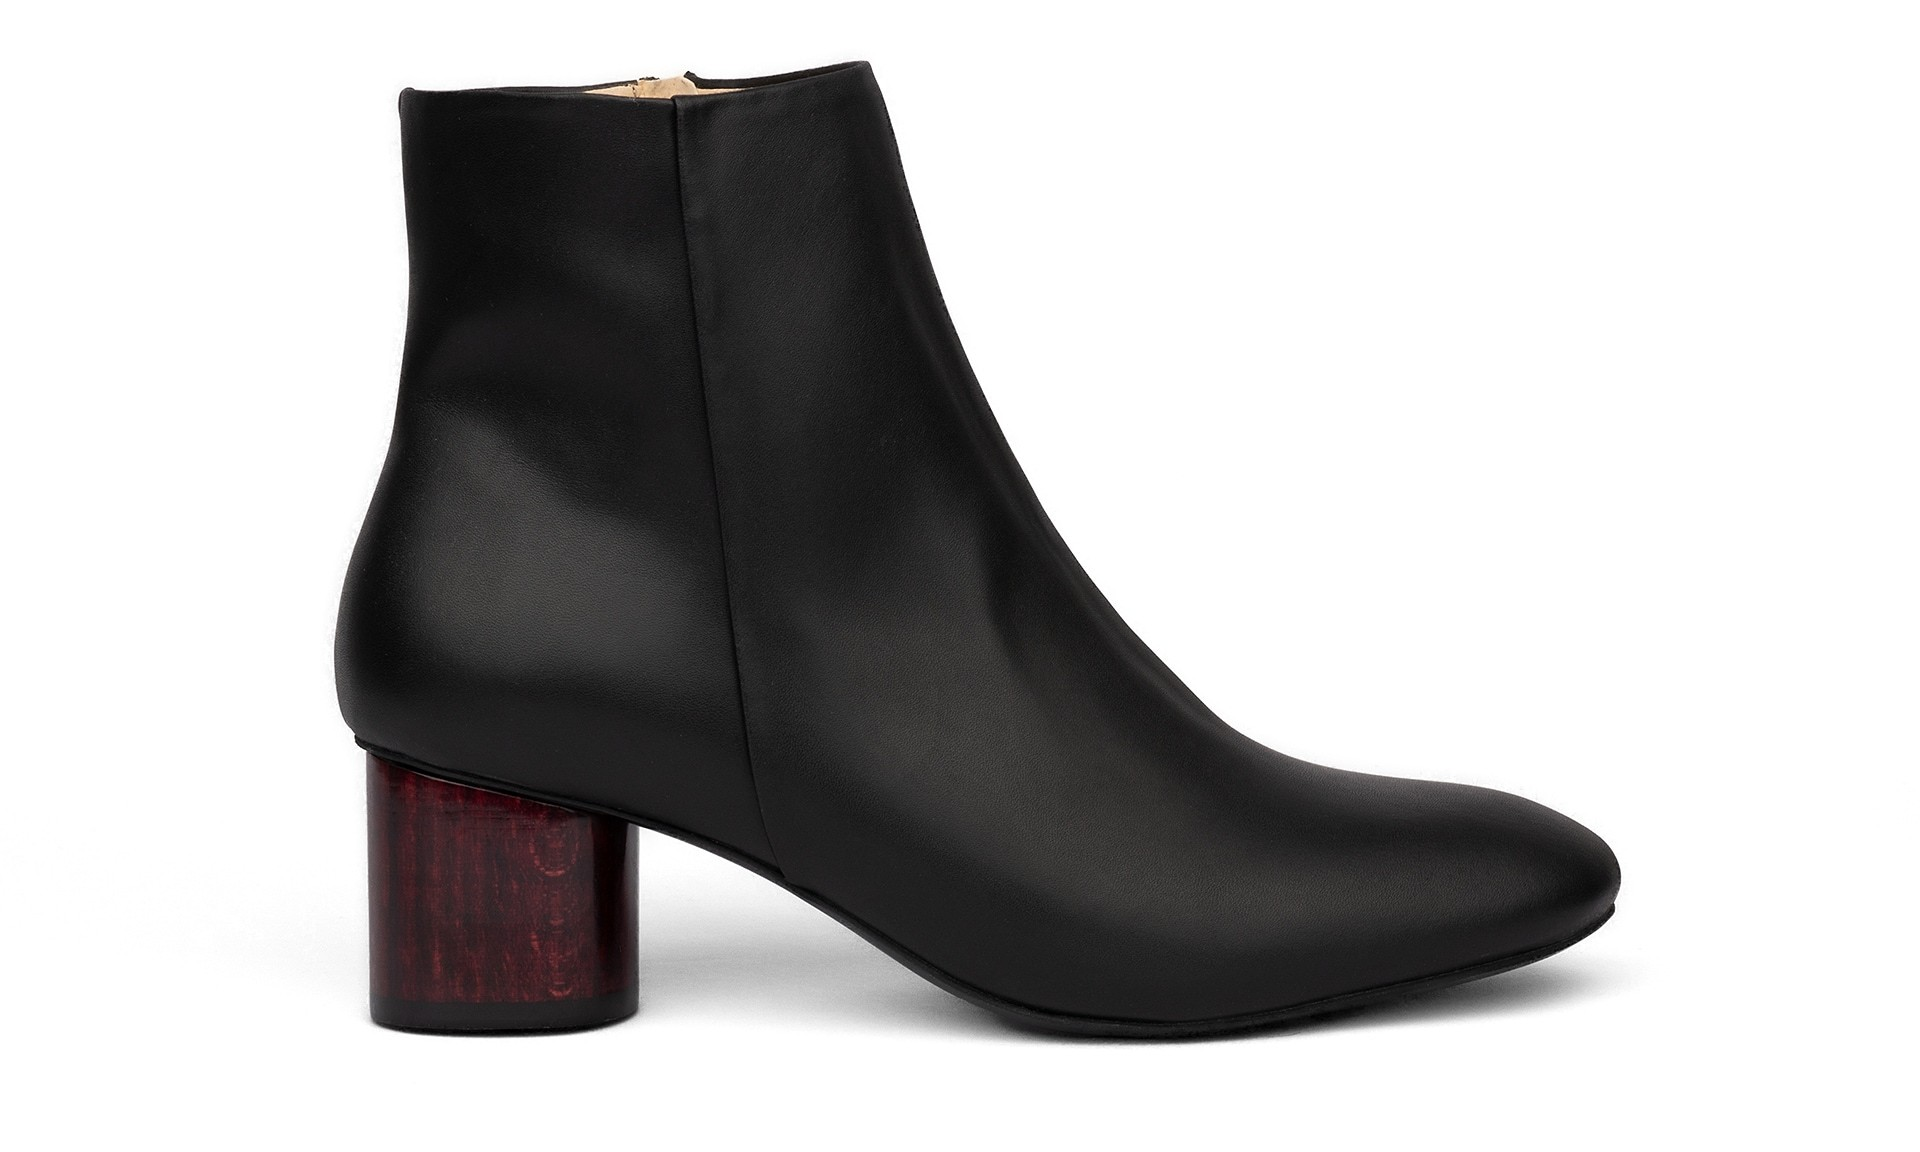 SYDNEY BROWN Low Ankle Boot Black Wine